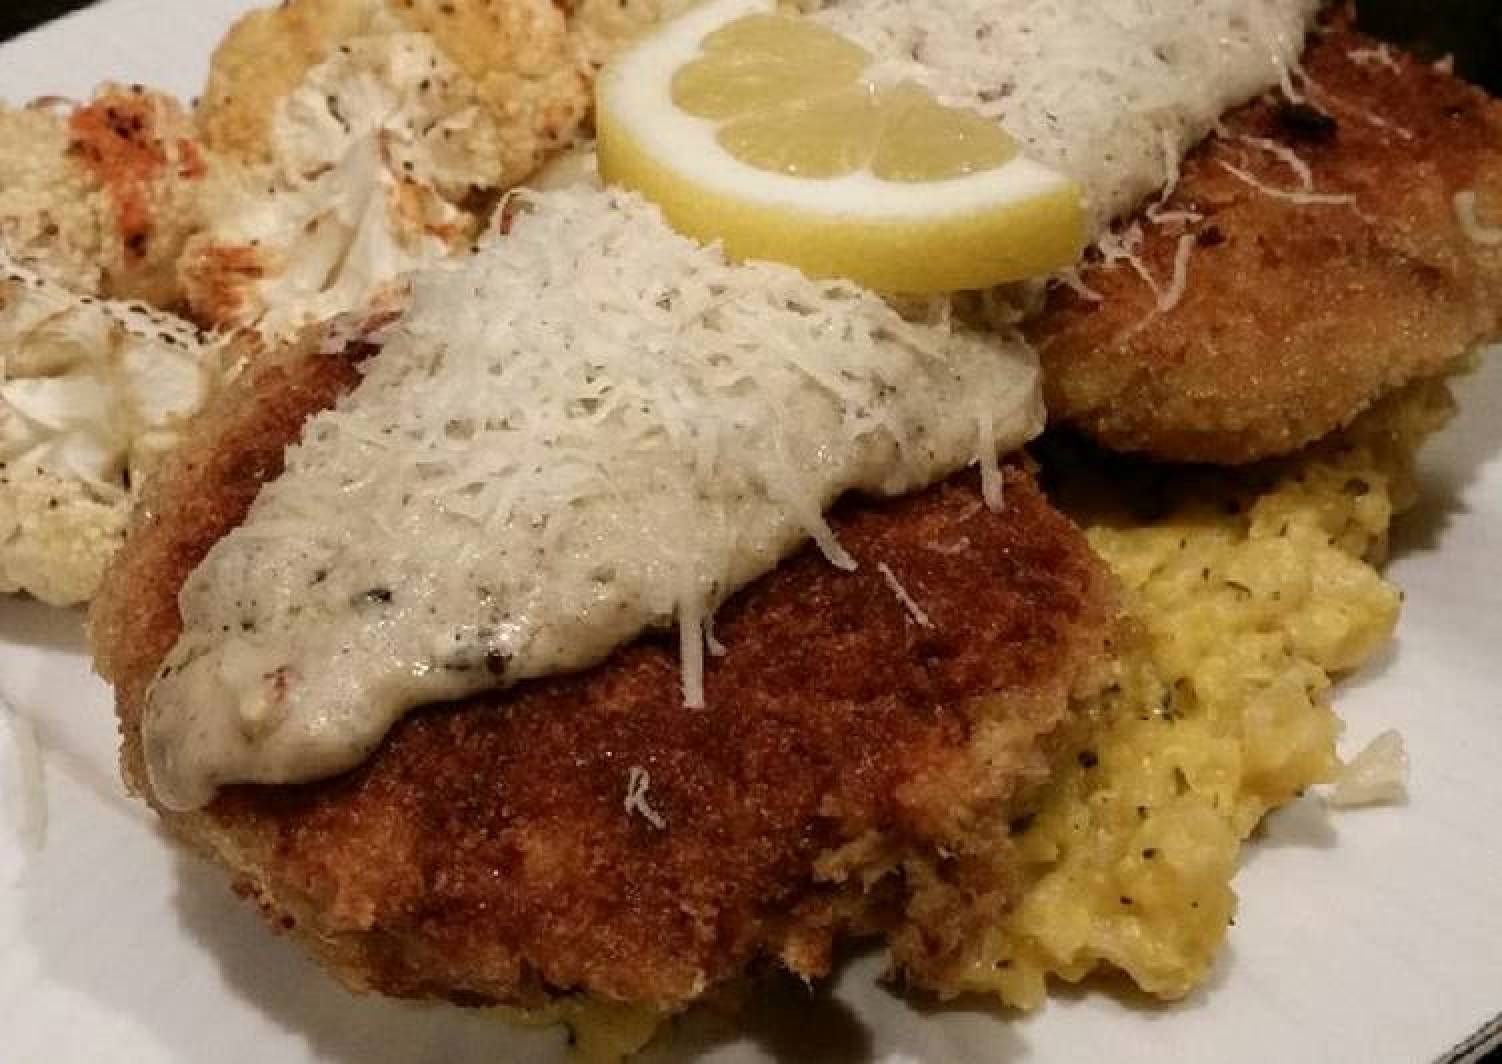 Brad's stuffed salmon cakes with lemon basil bechamel sauce